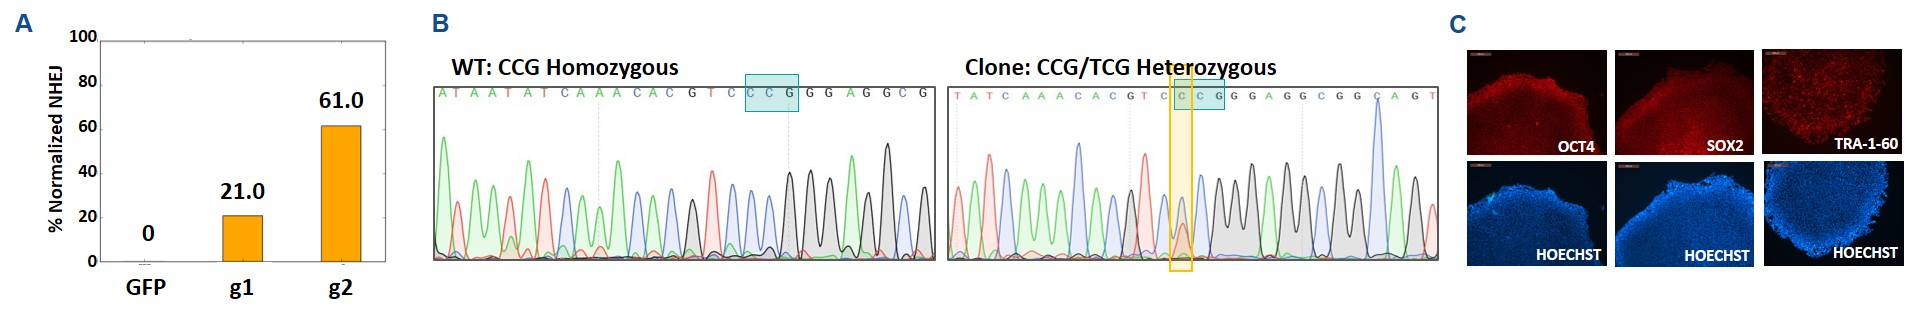 CASESTUDY-CRISPR-iPSC-pointmutation-nosilentmutation